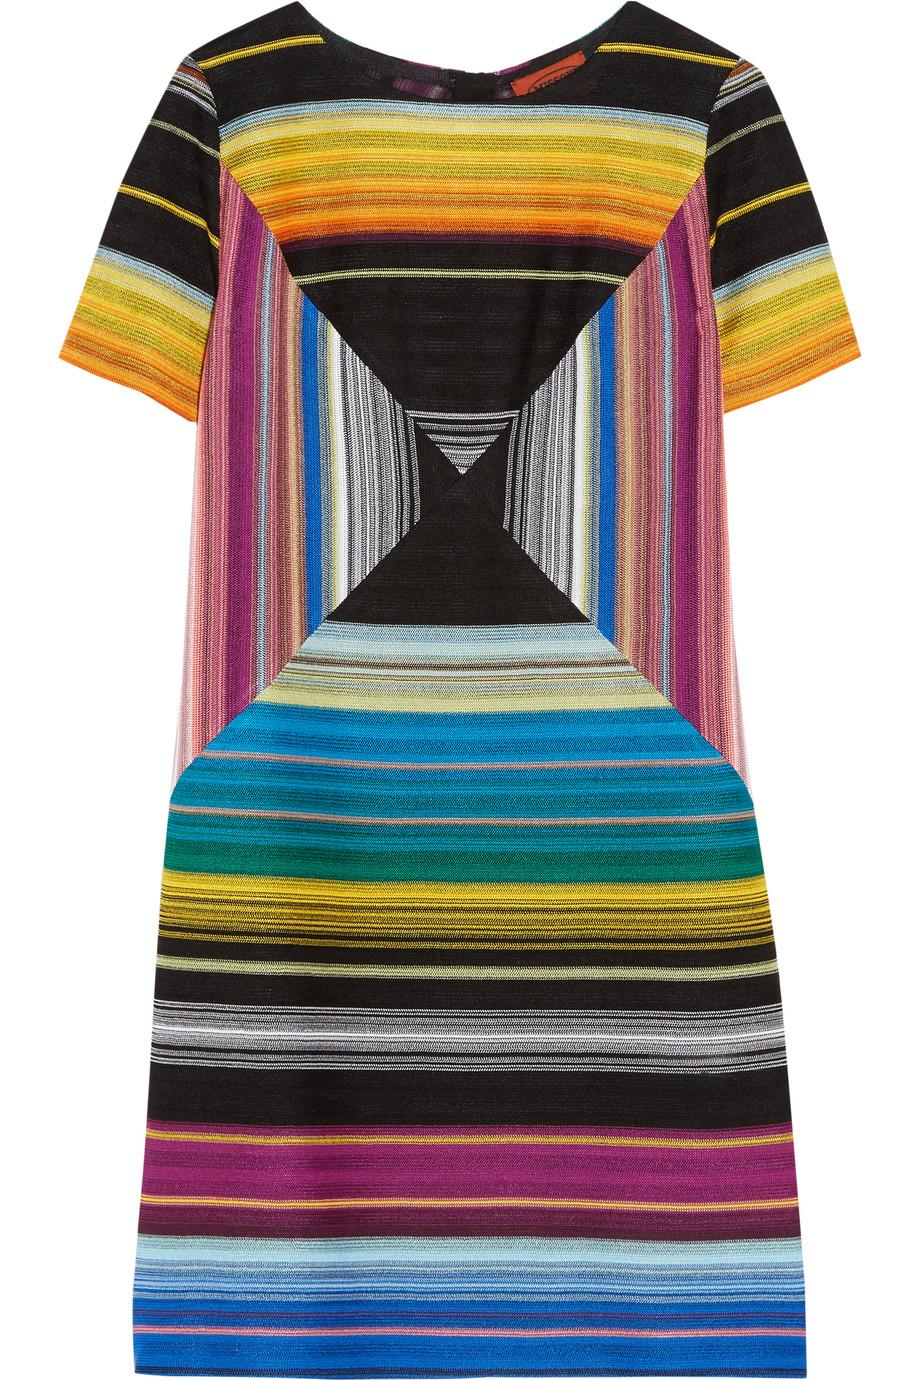 Missoni Crochet-Knit Mini Dress, Blue, Women's, Size: 44